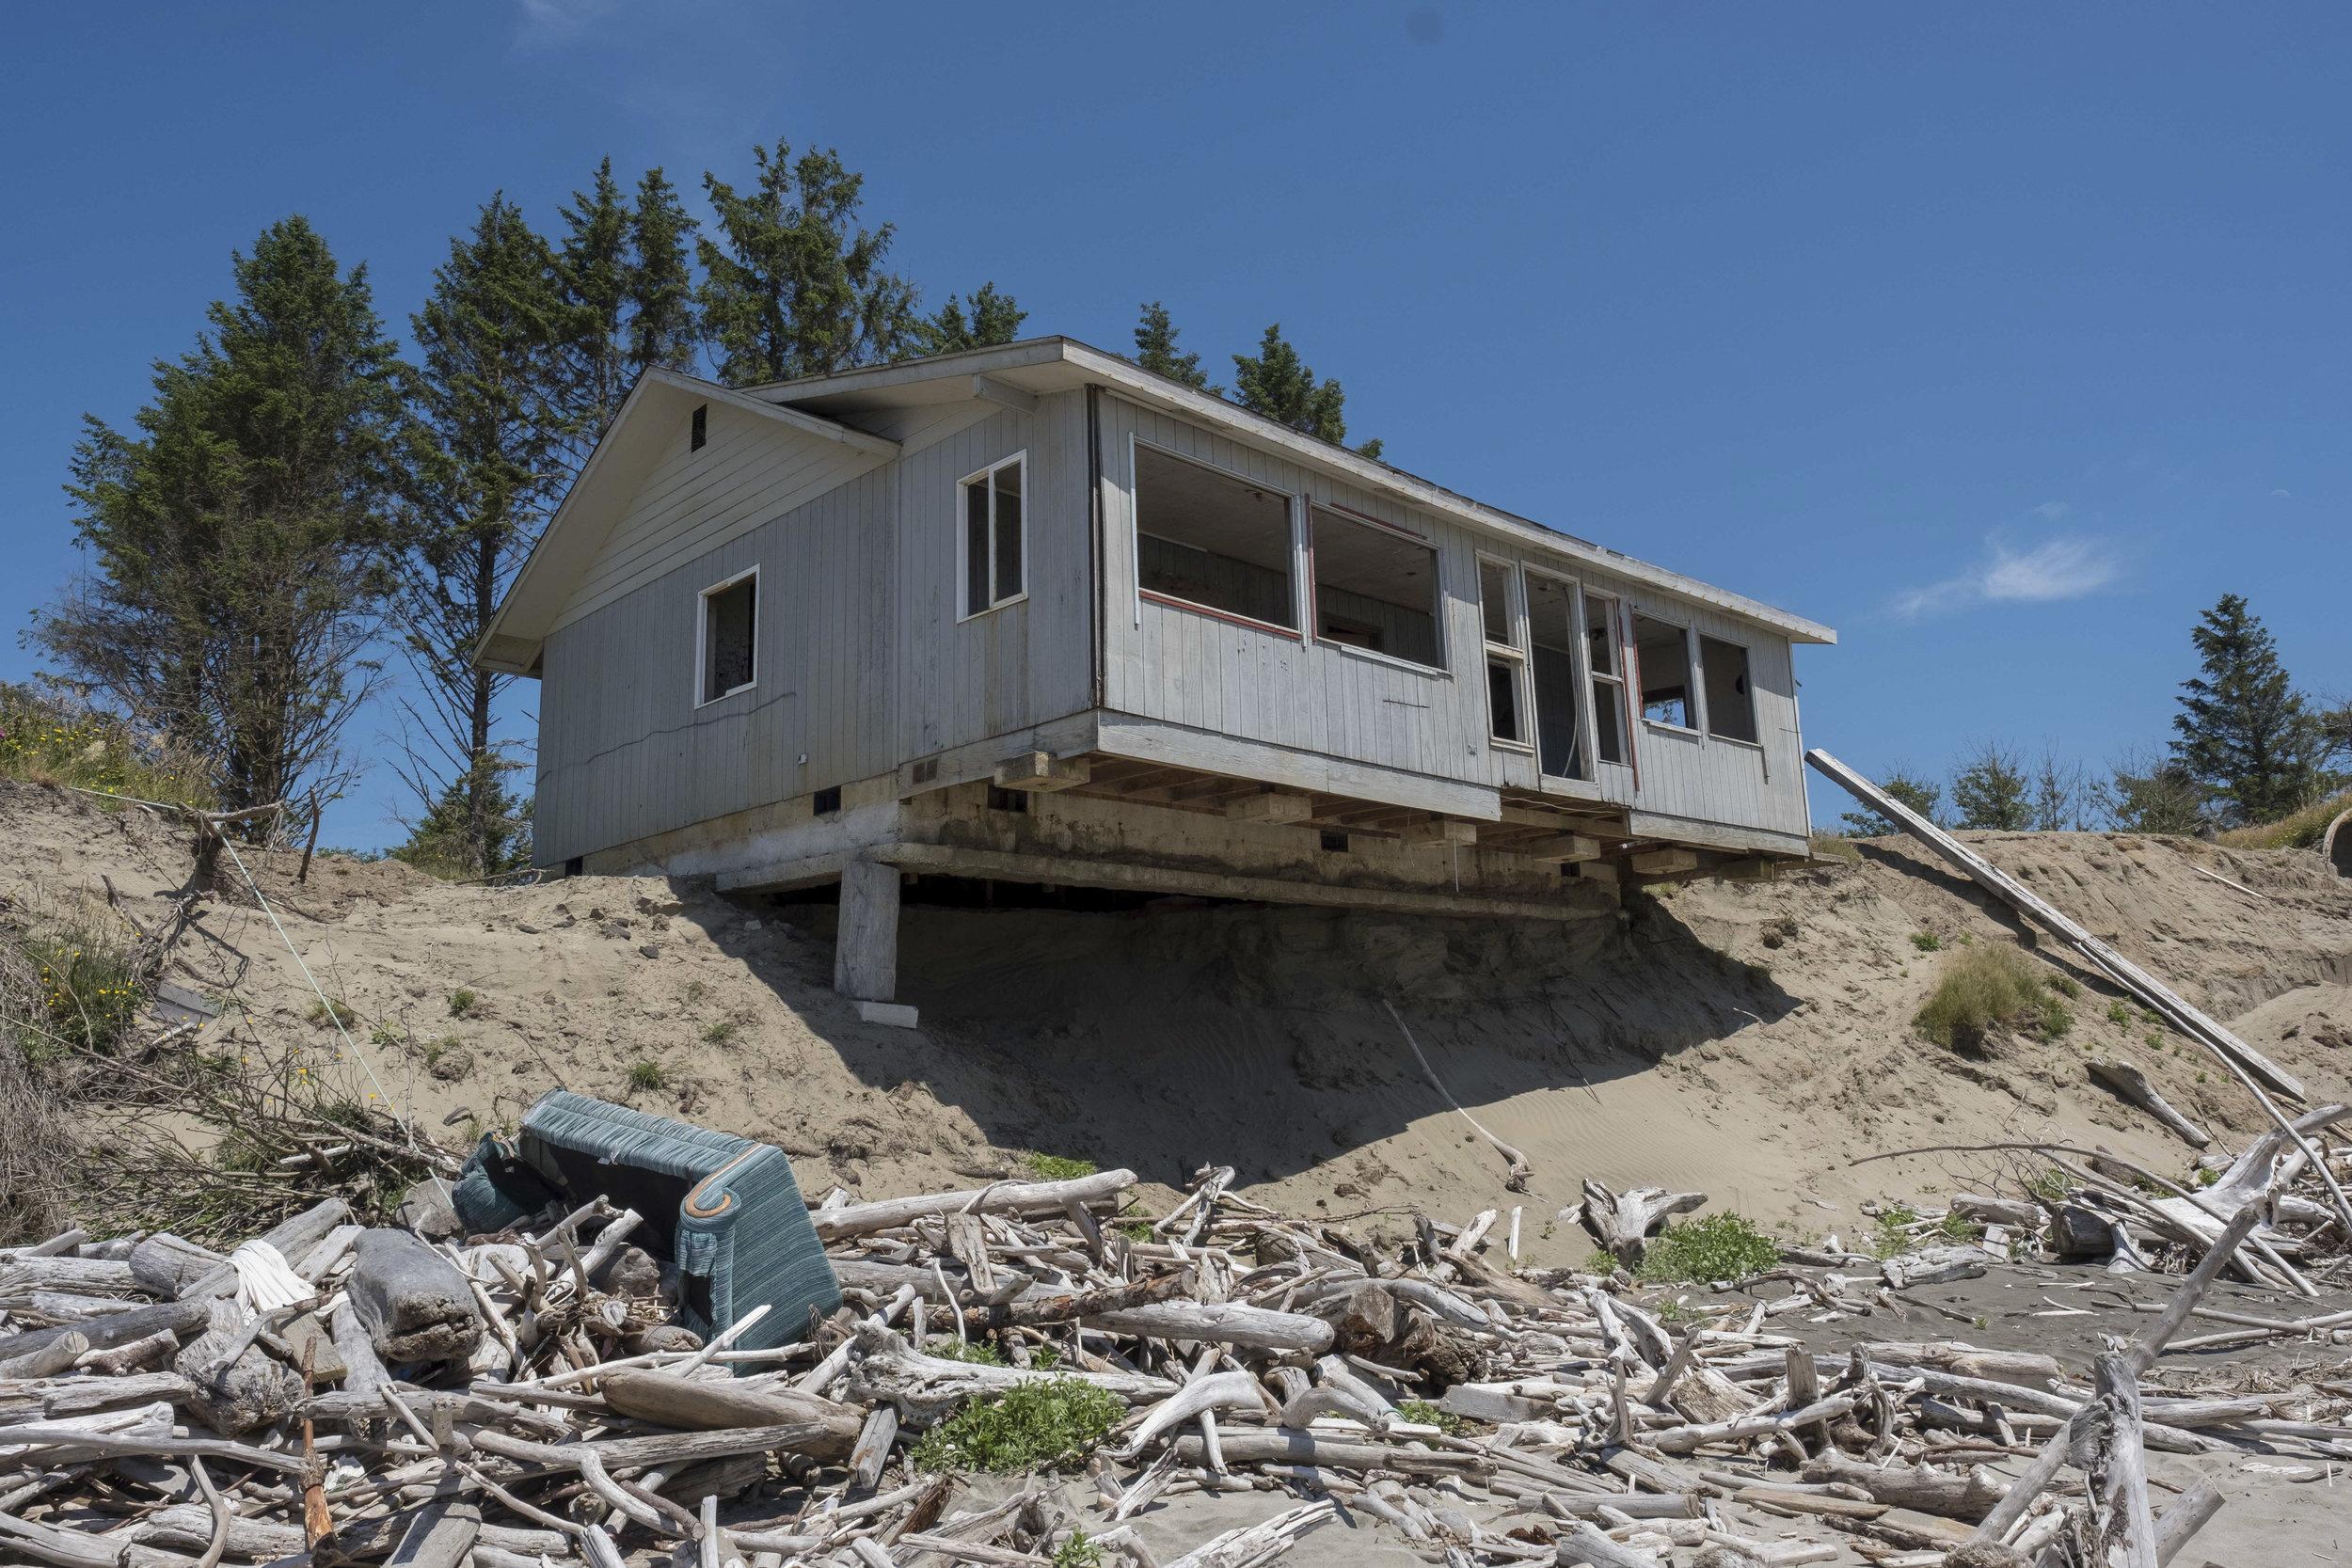 Erosion damage and debris on Washaway Beach. Photo by Kit Swartz.